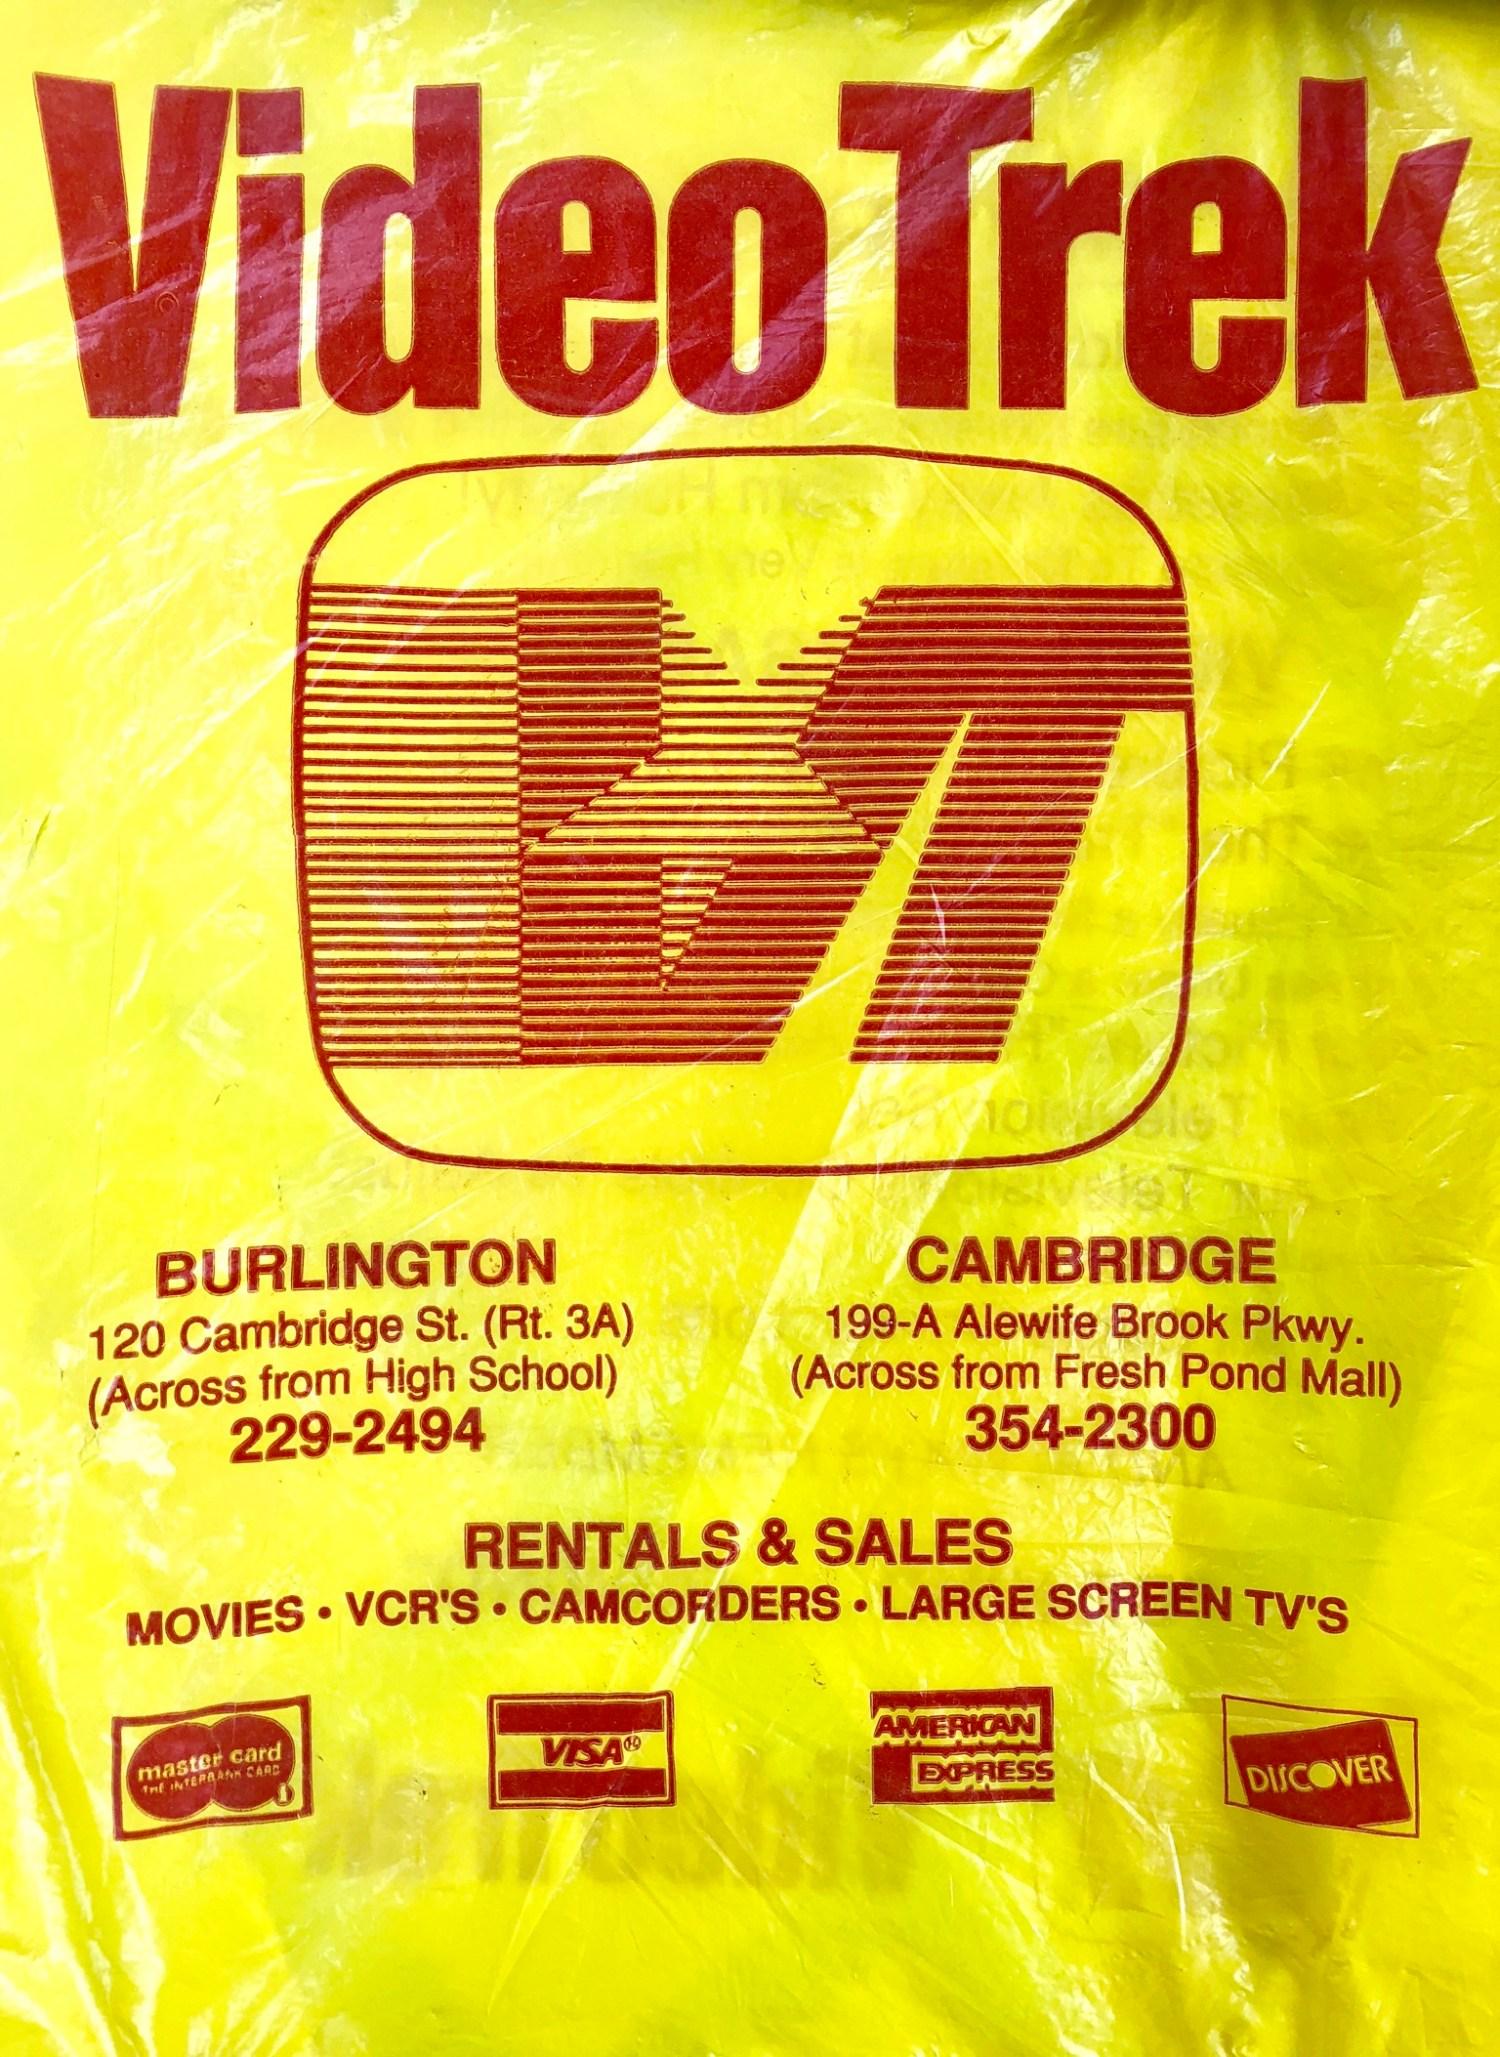 Video Trek bag, Burlington MA. Photo credit: Cheryl Hayes